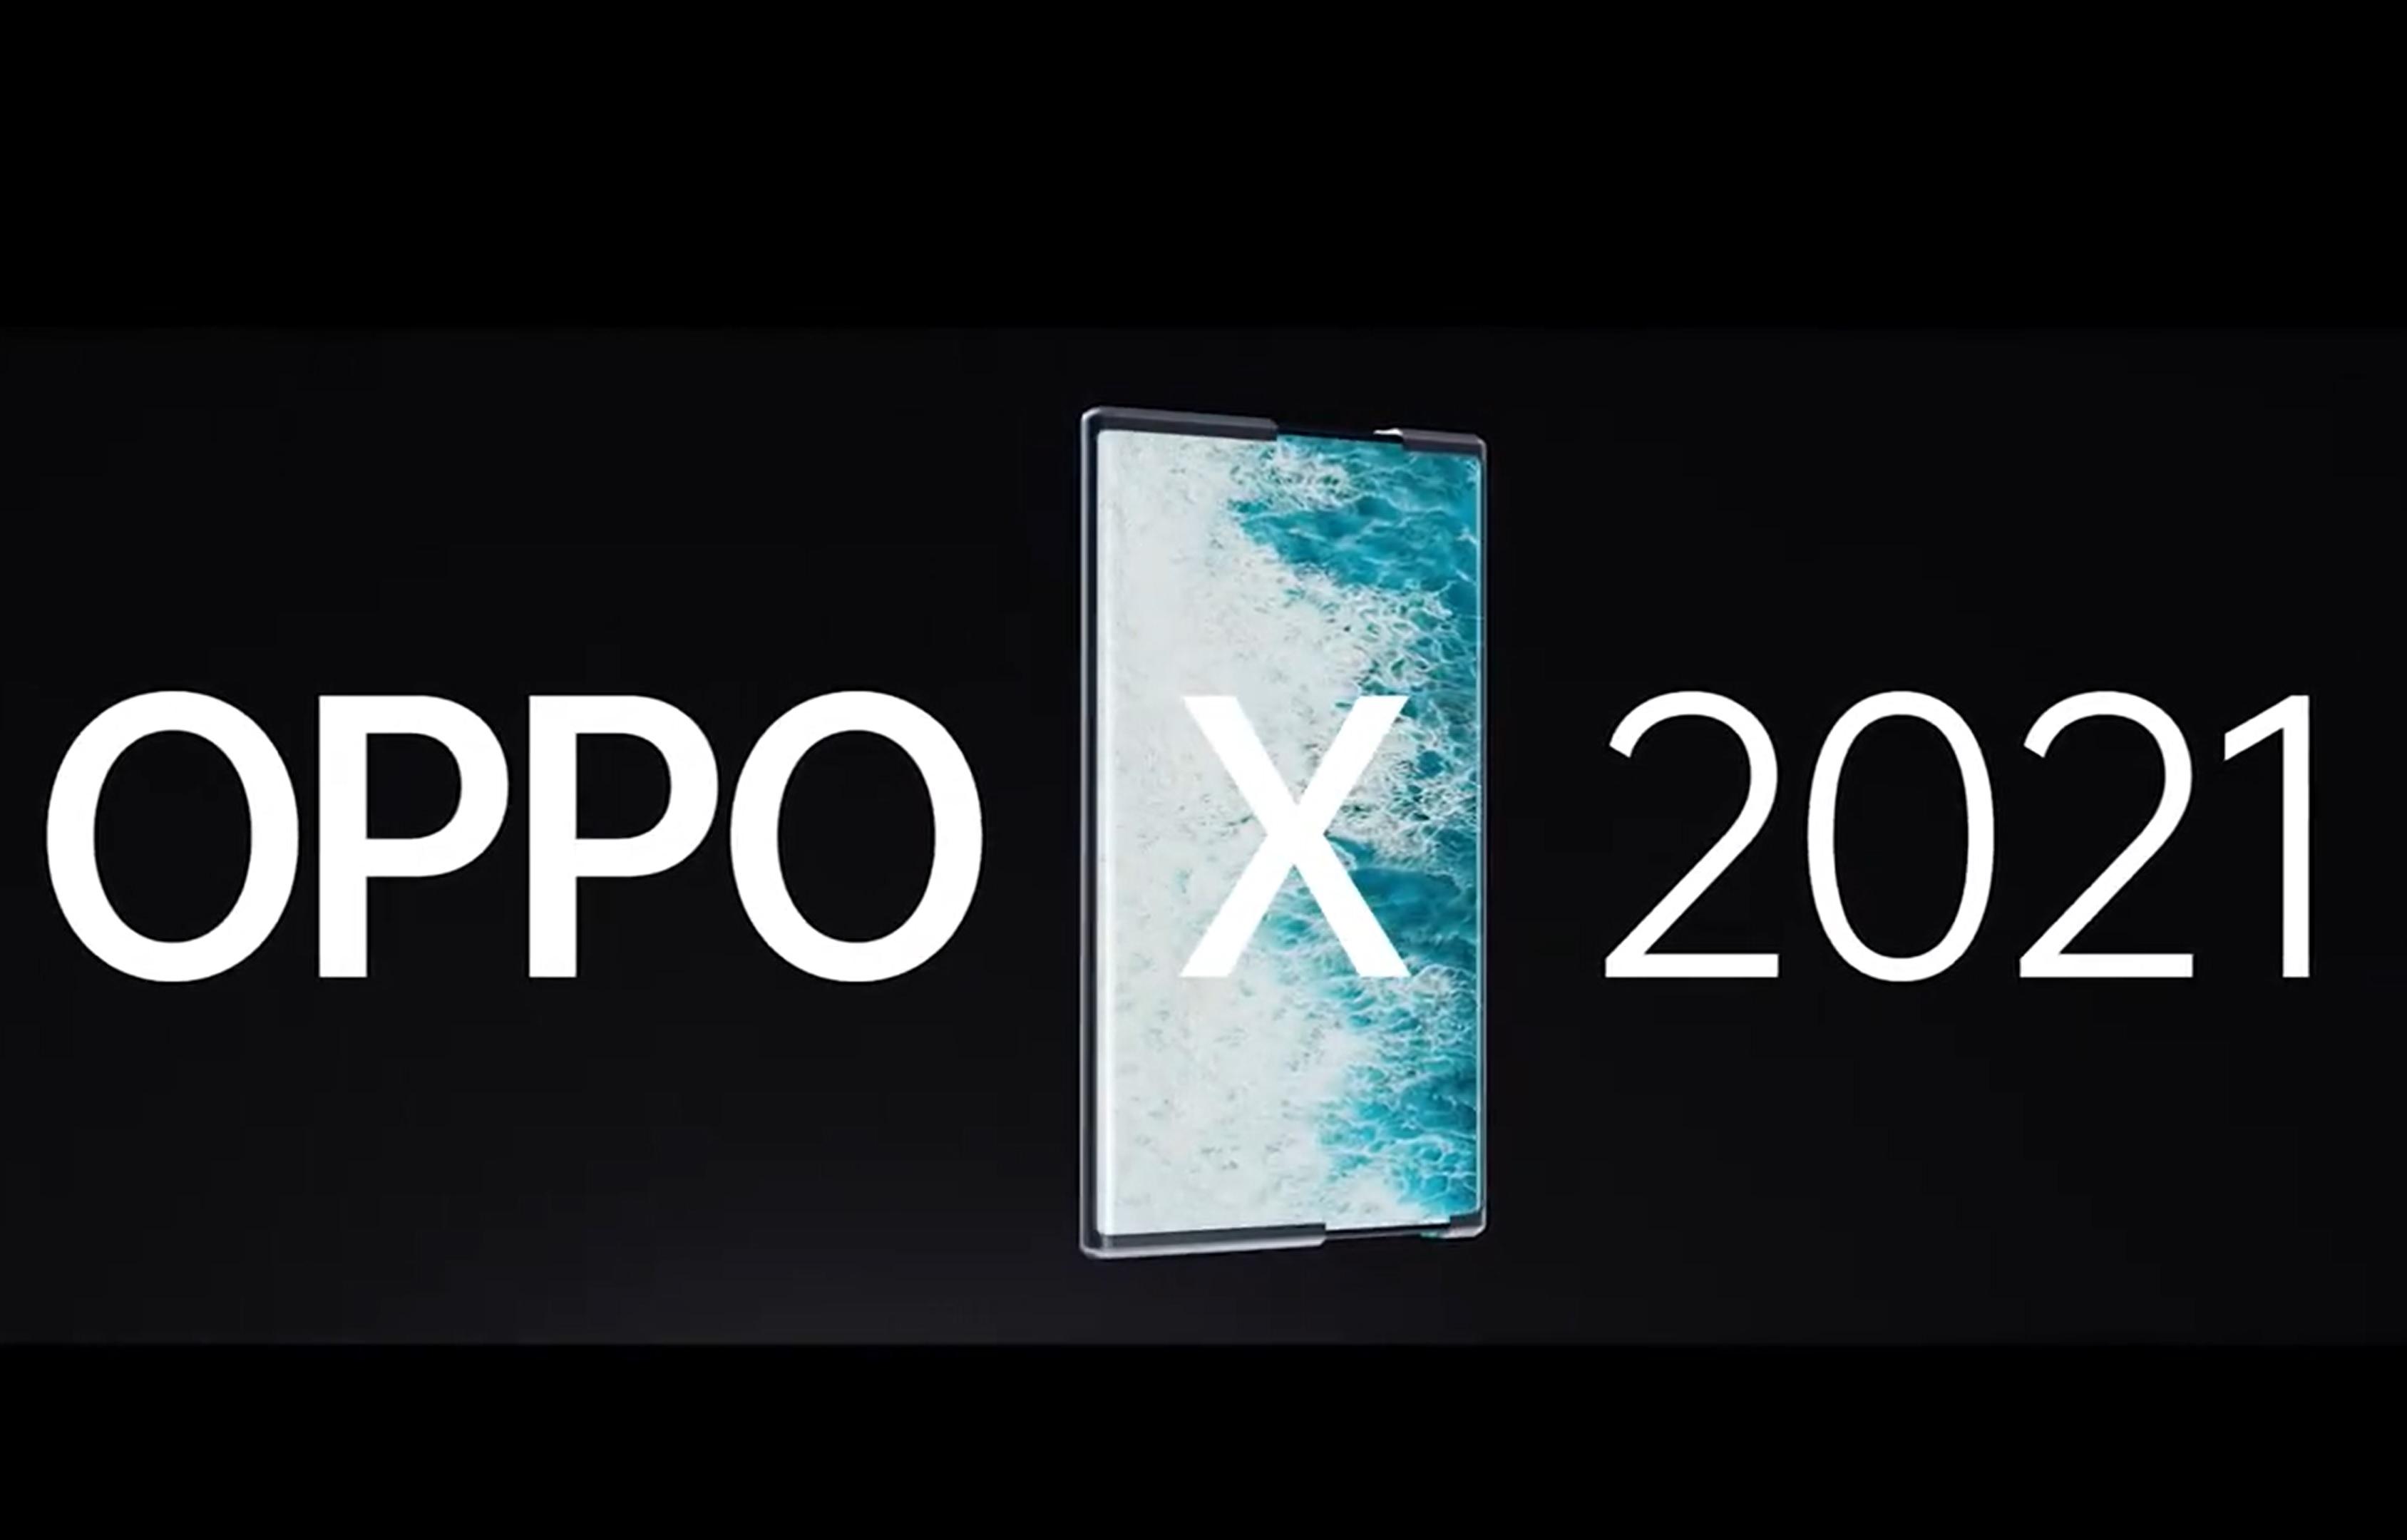 Oppo Smartwatch 2021